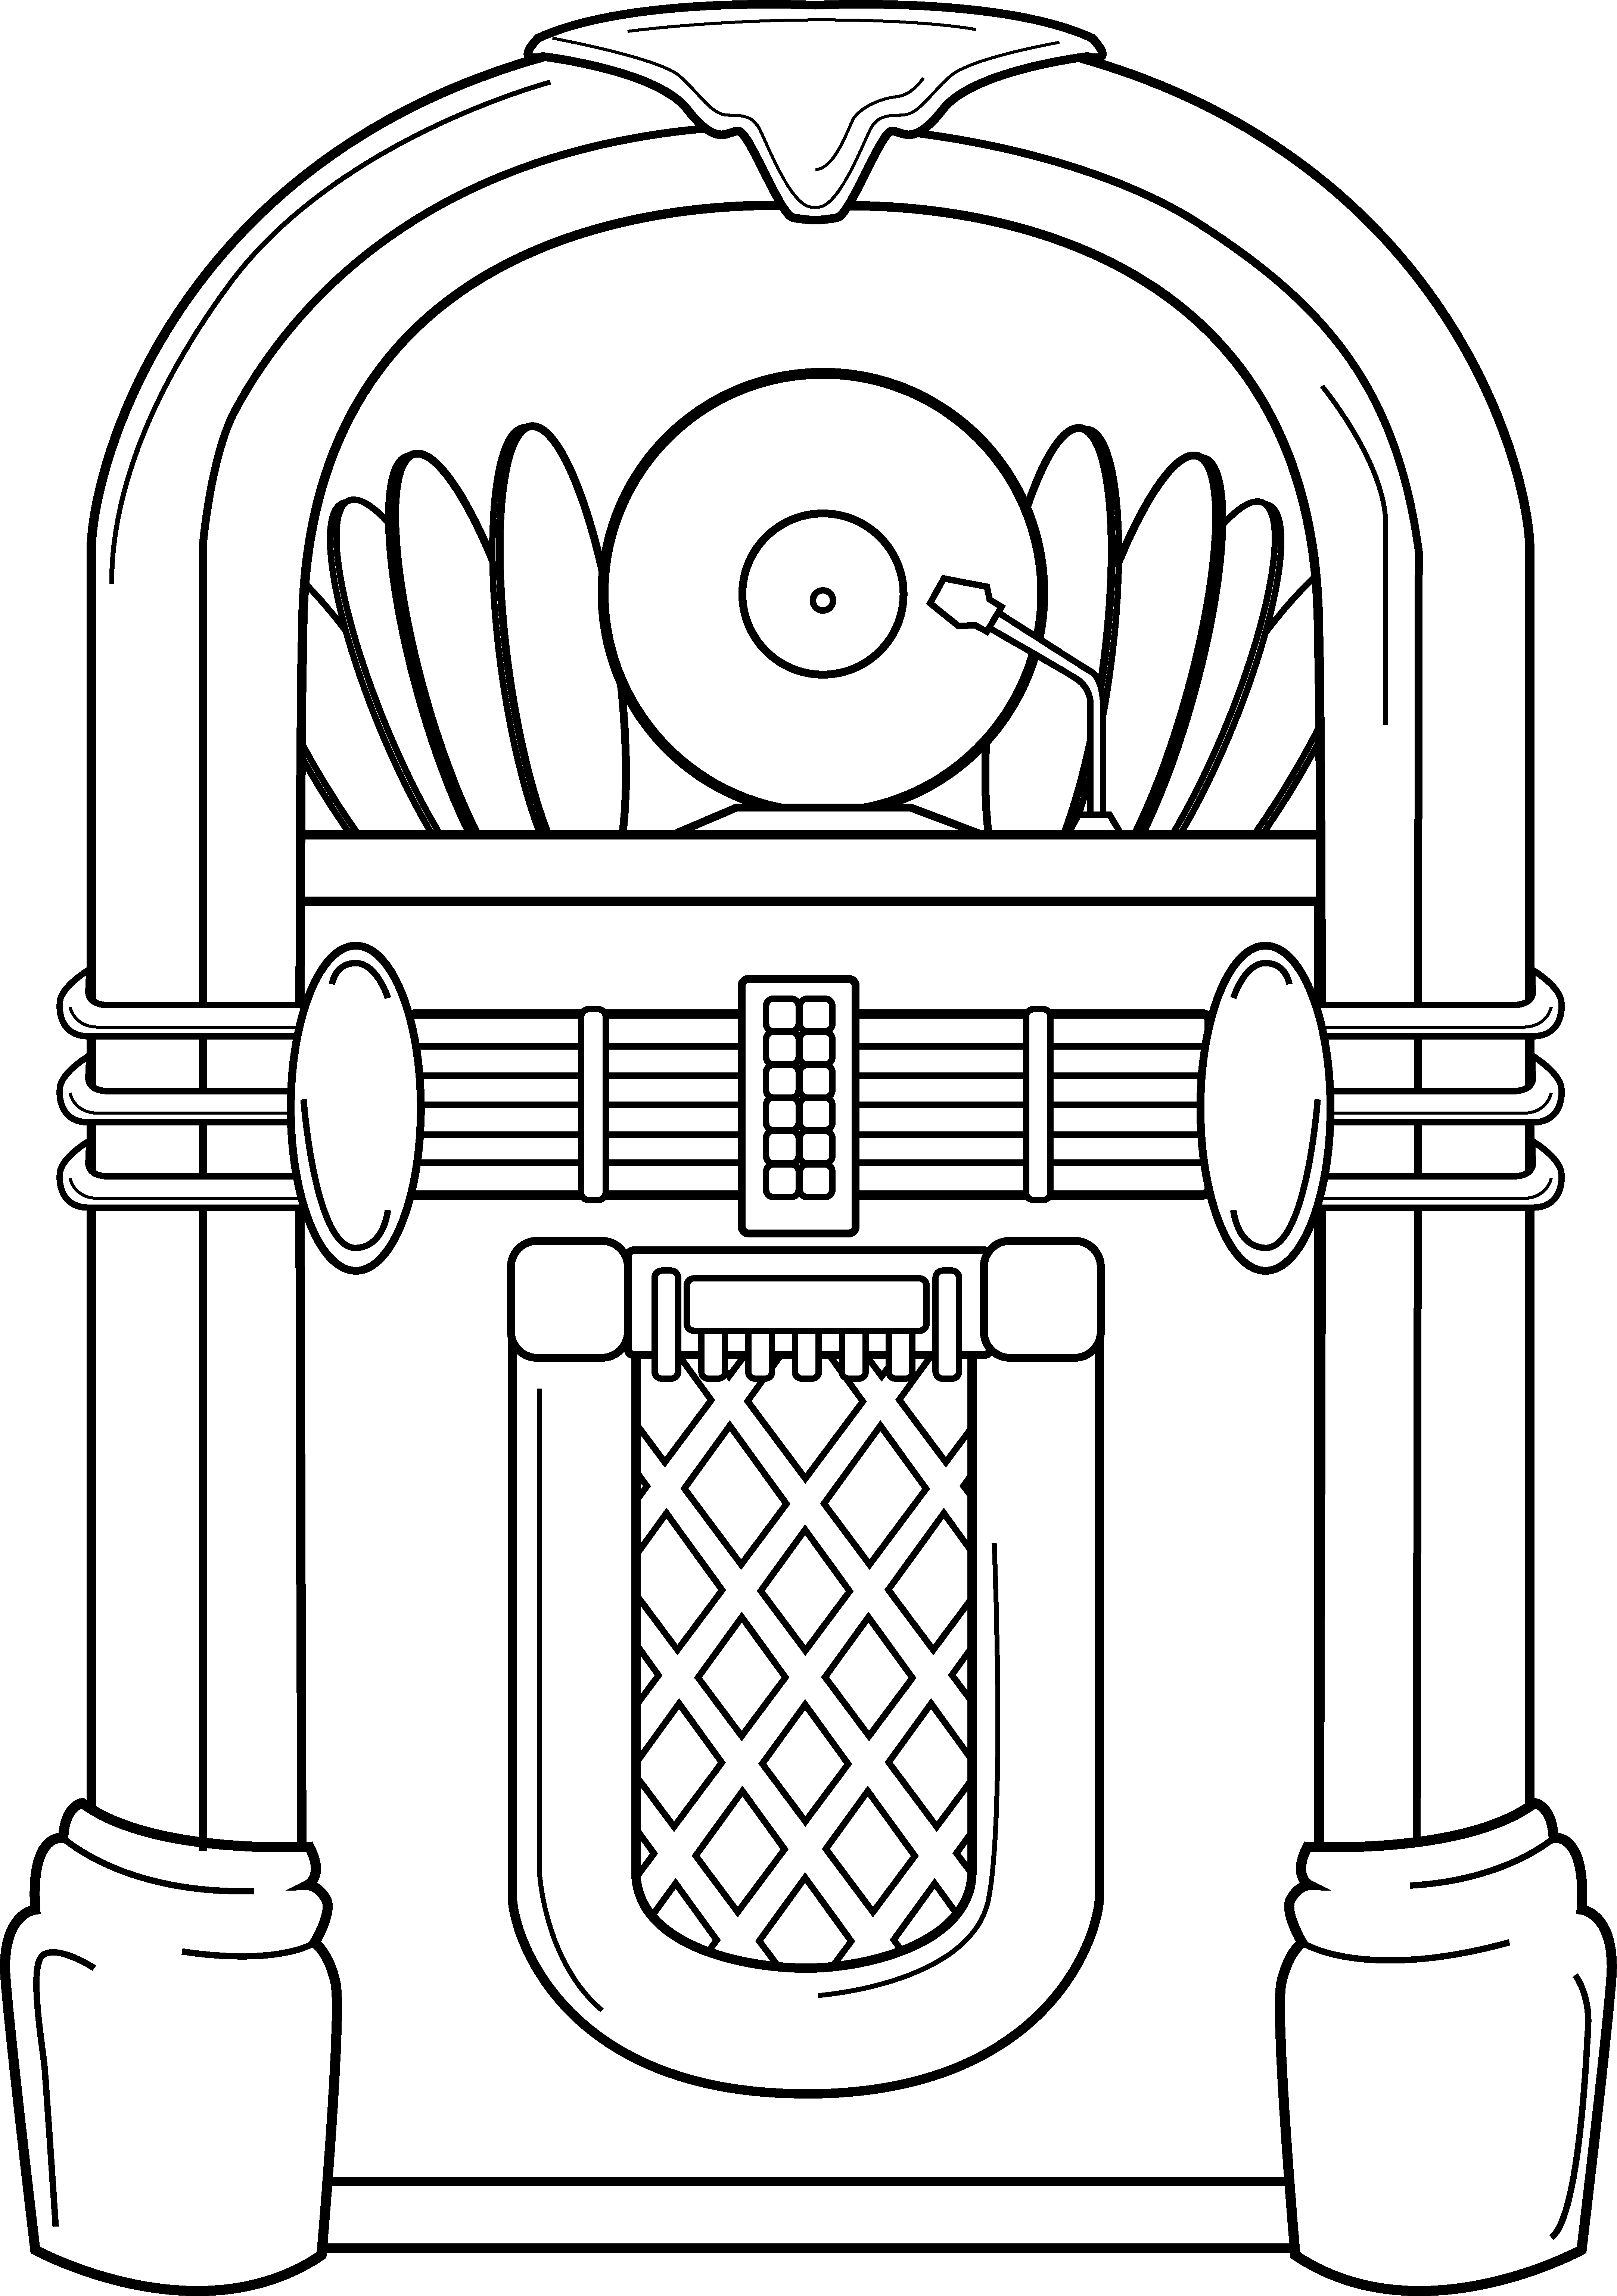 Jukebox Clipart. Jukebox Coloring Page-Jukebox Clipart. Jukebox Coloring Page-8